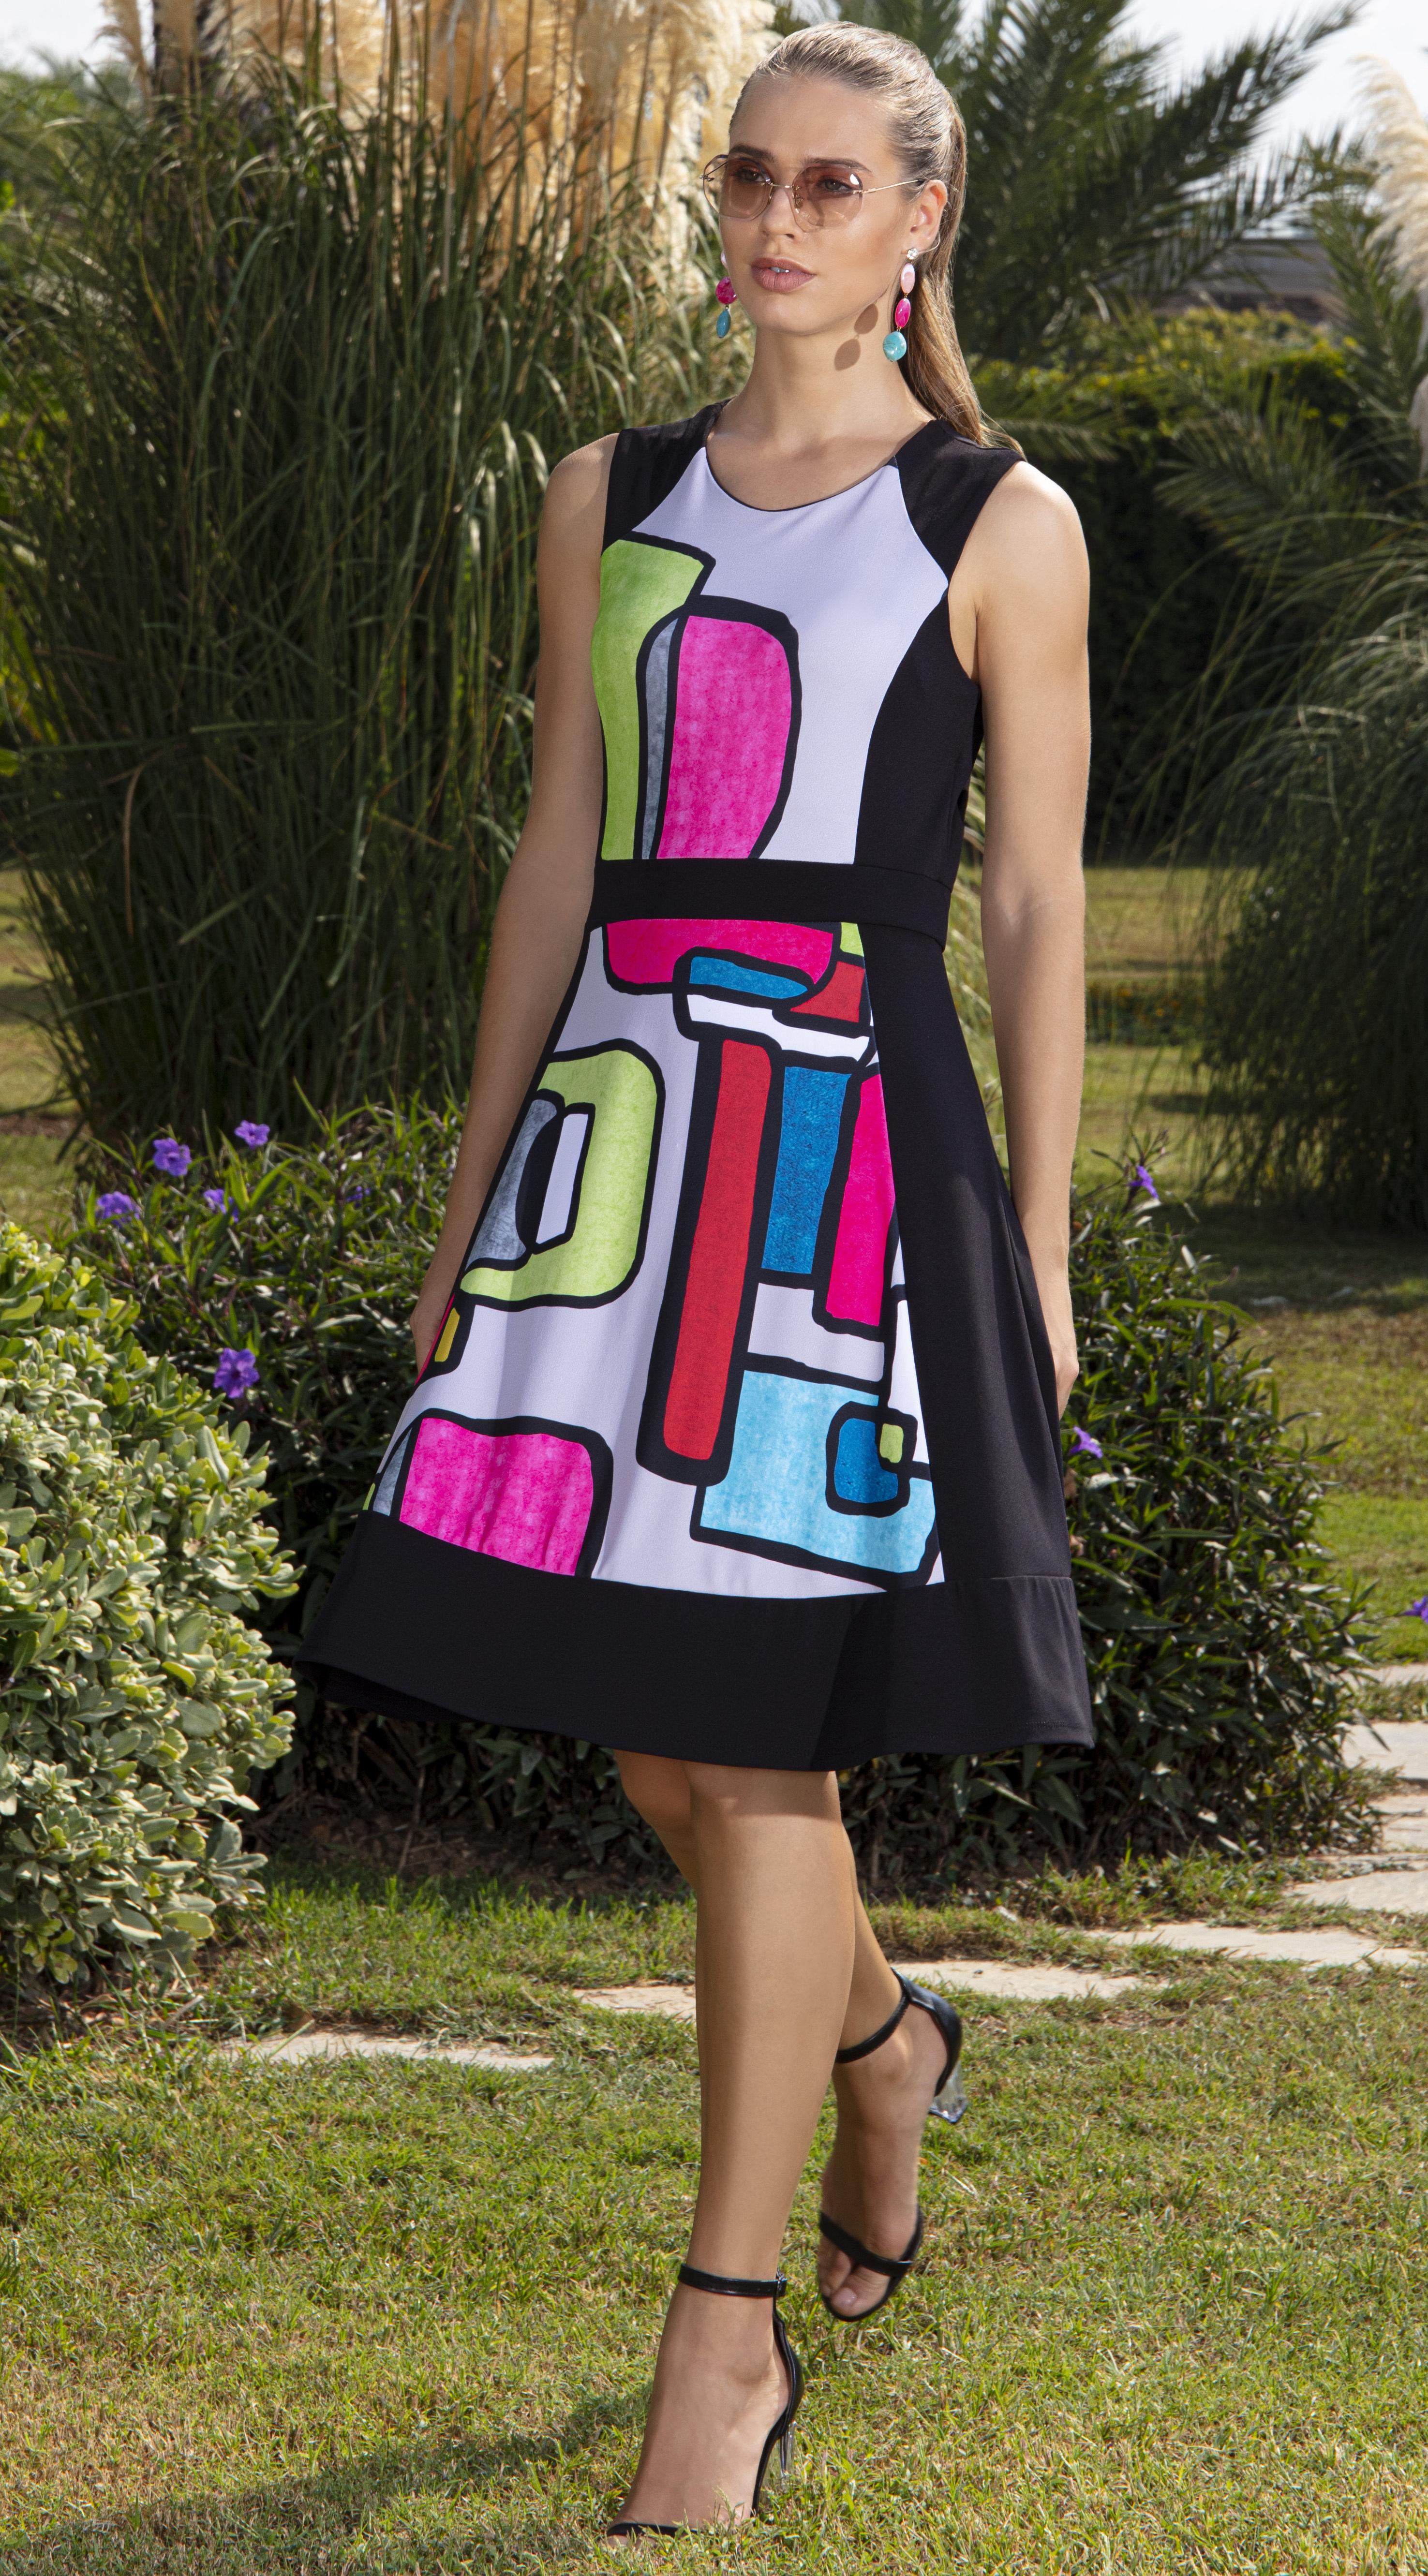 Simply Art Dolcezza: Mid Century Vibrant Romance Abstract Art Dress (Few Left!) DOLCEZZA_SIMPLYART_20636_N1